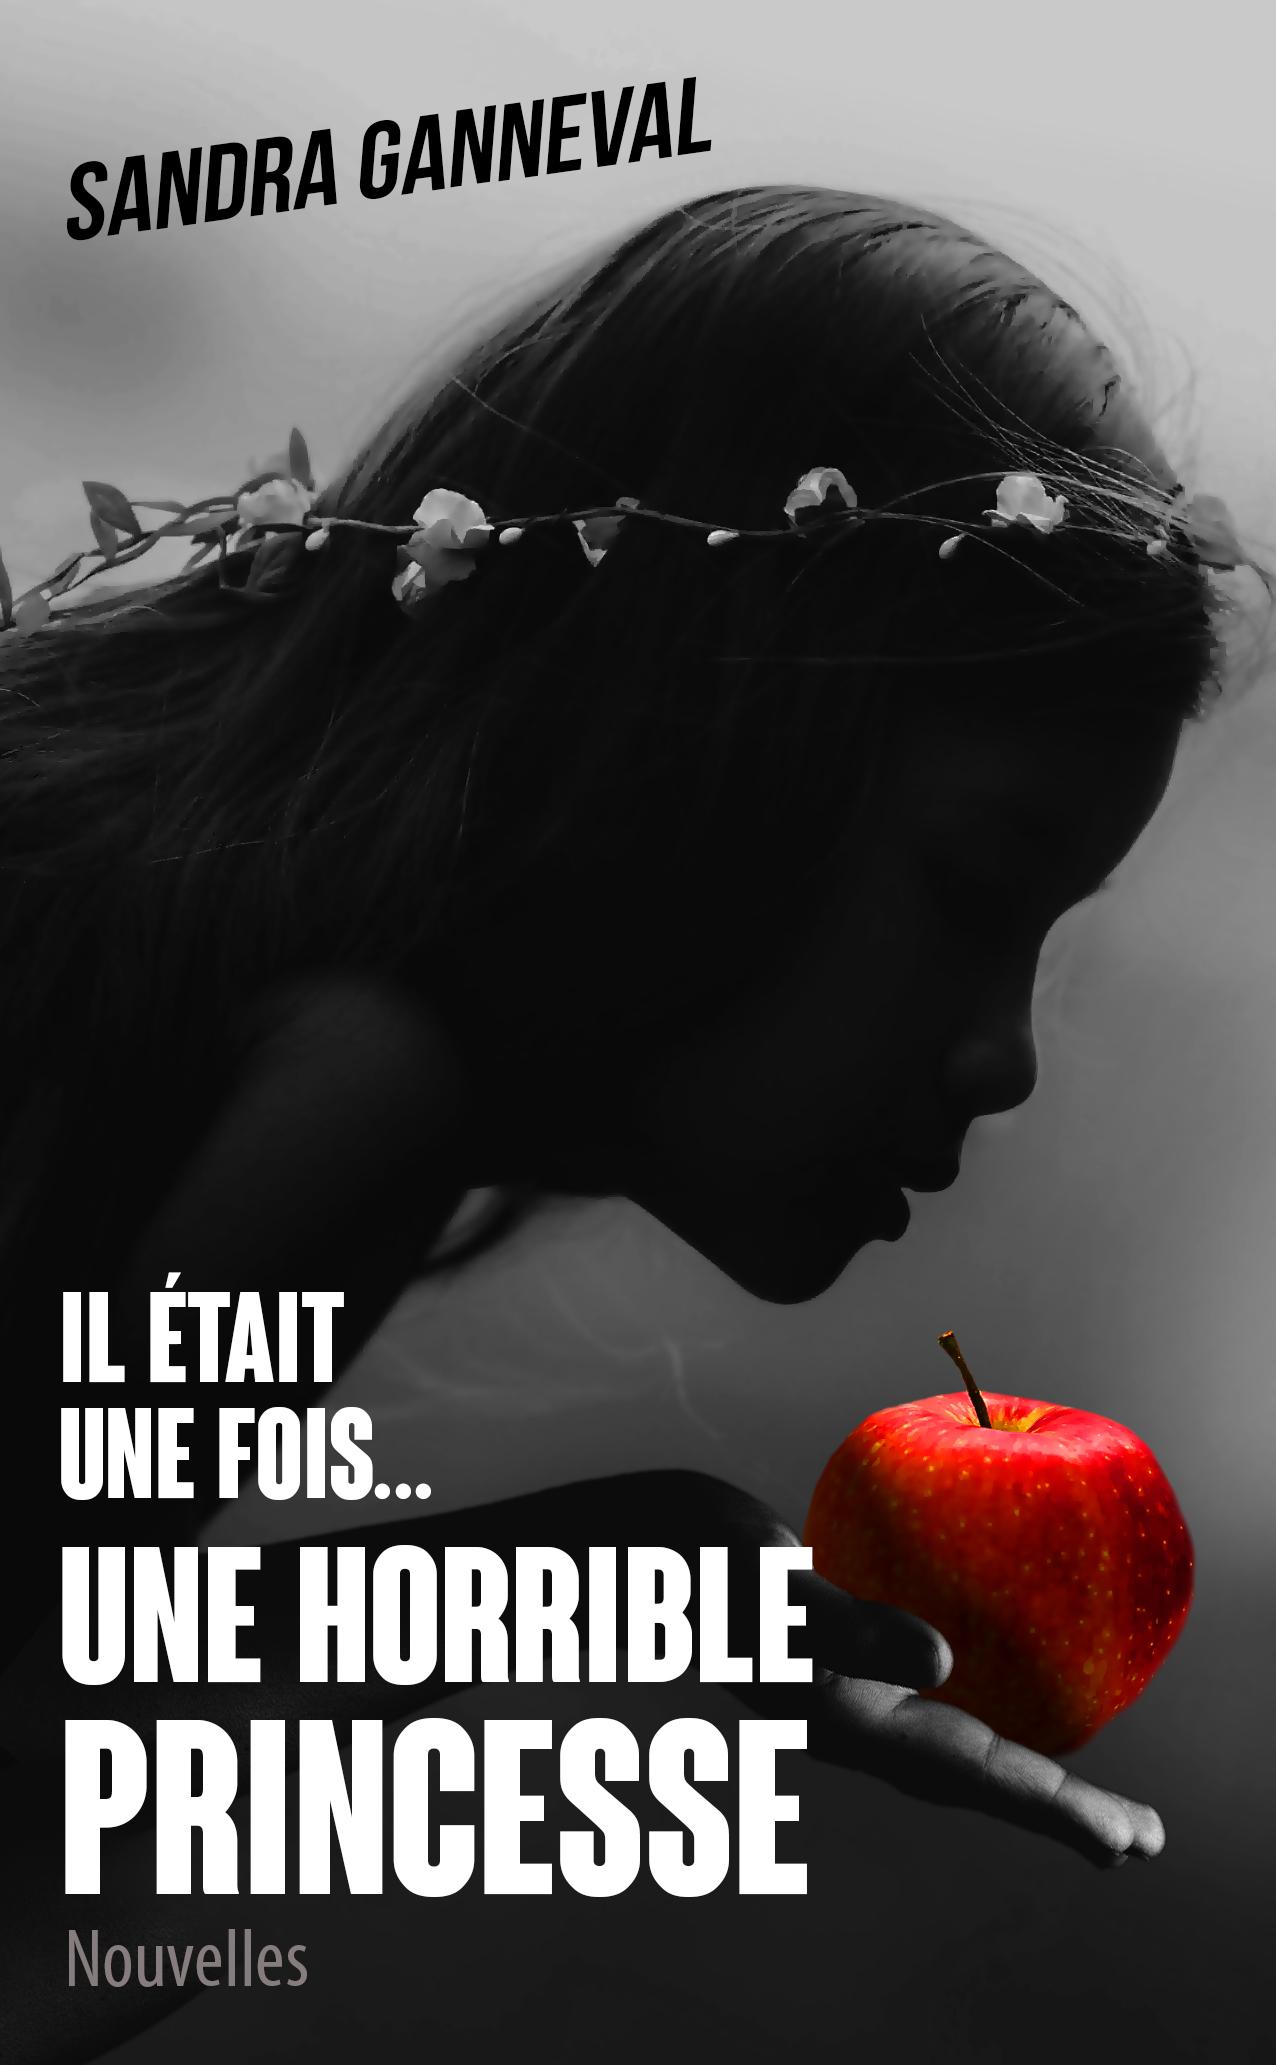 http://static.blog4ever.com/2011/05/490189/C1-Une-horrible-princesse-10-8x17-48.jpg